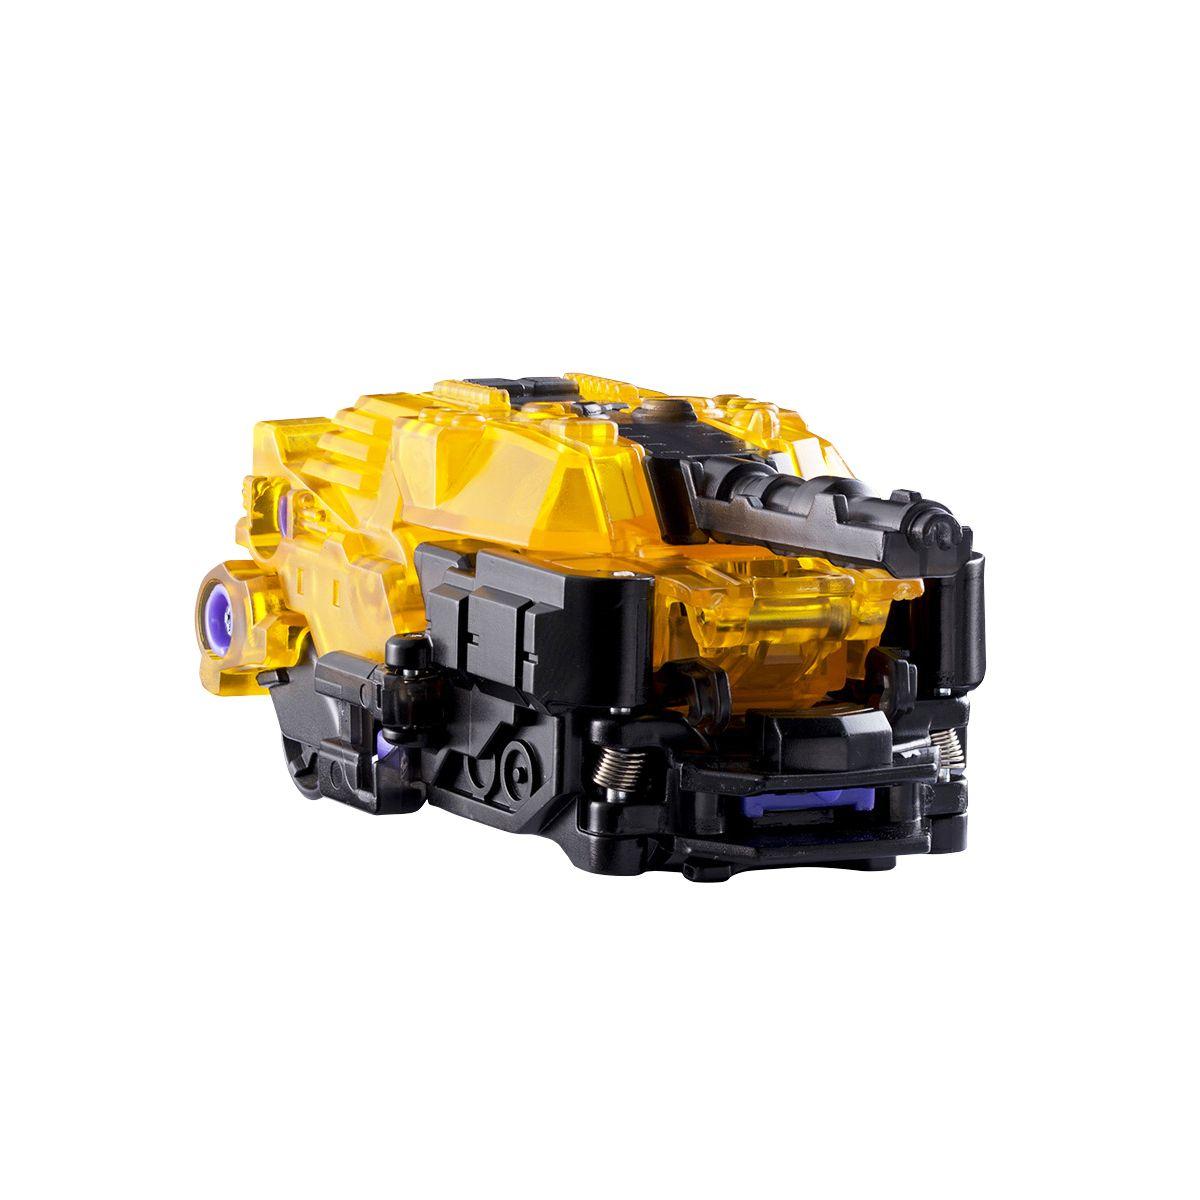 Машинка трансформер SCREECHERS WILD L 2 ТЕ РЕККЕР